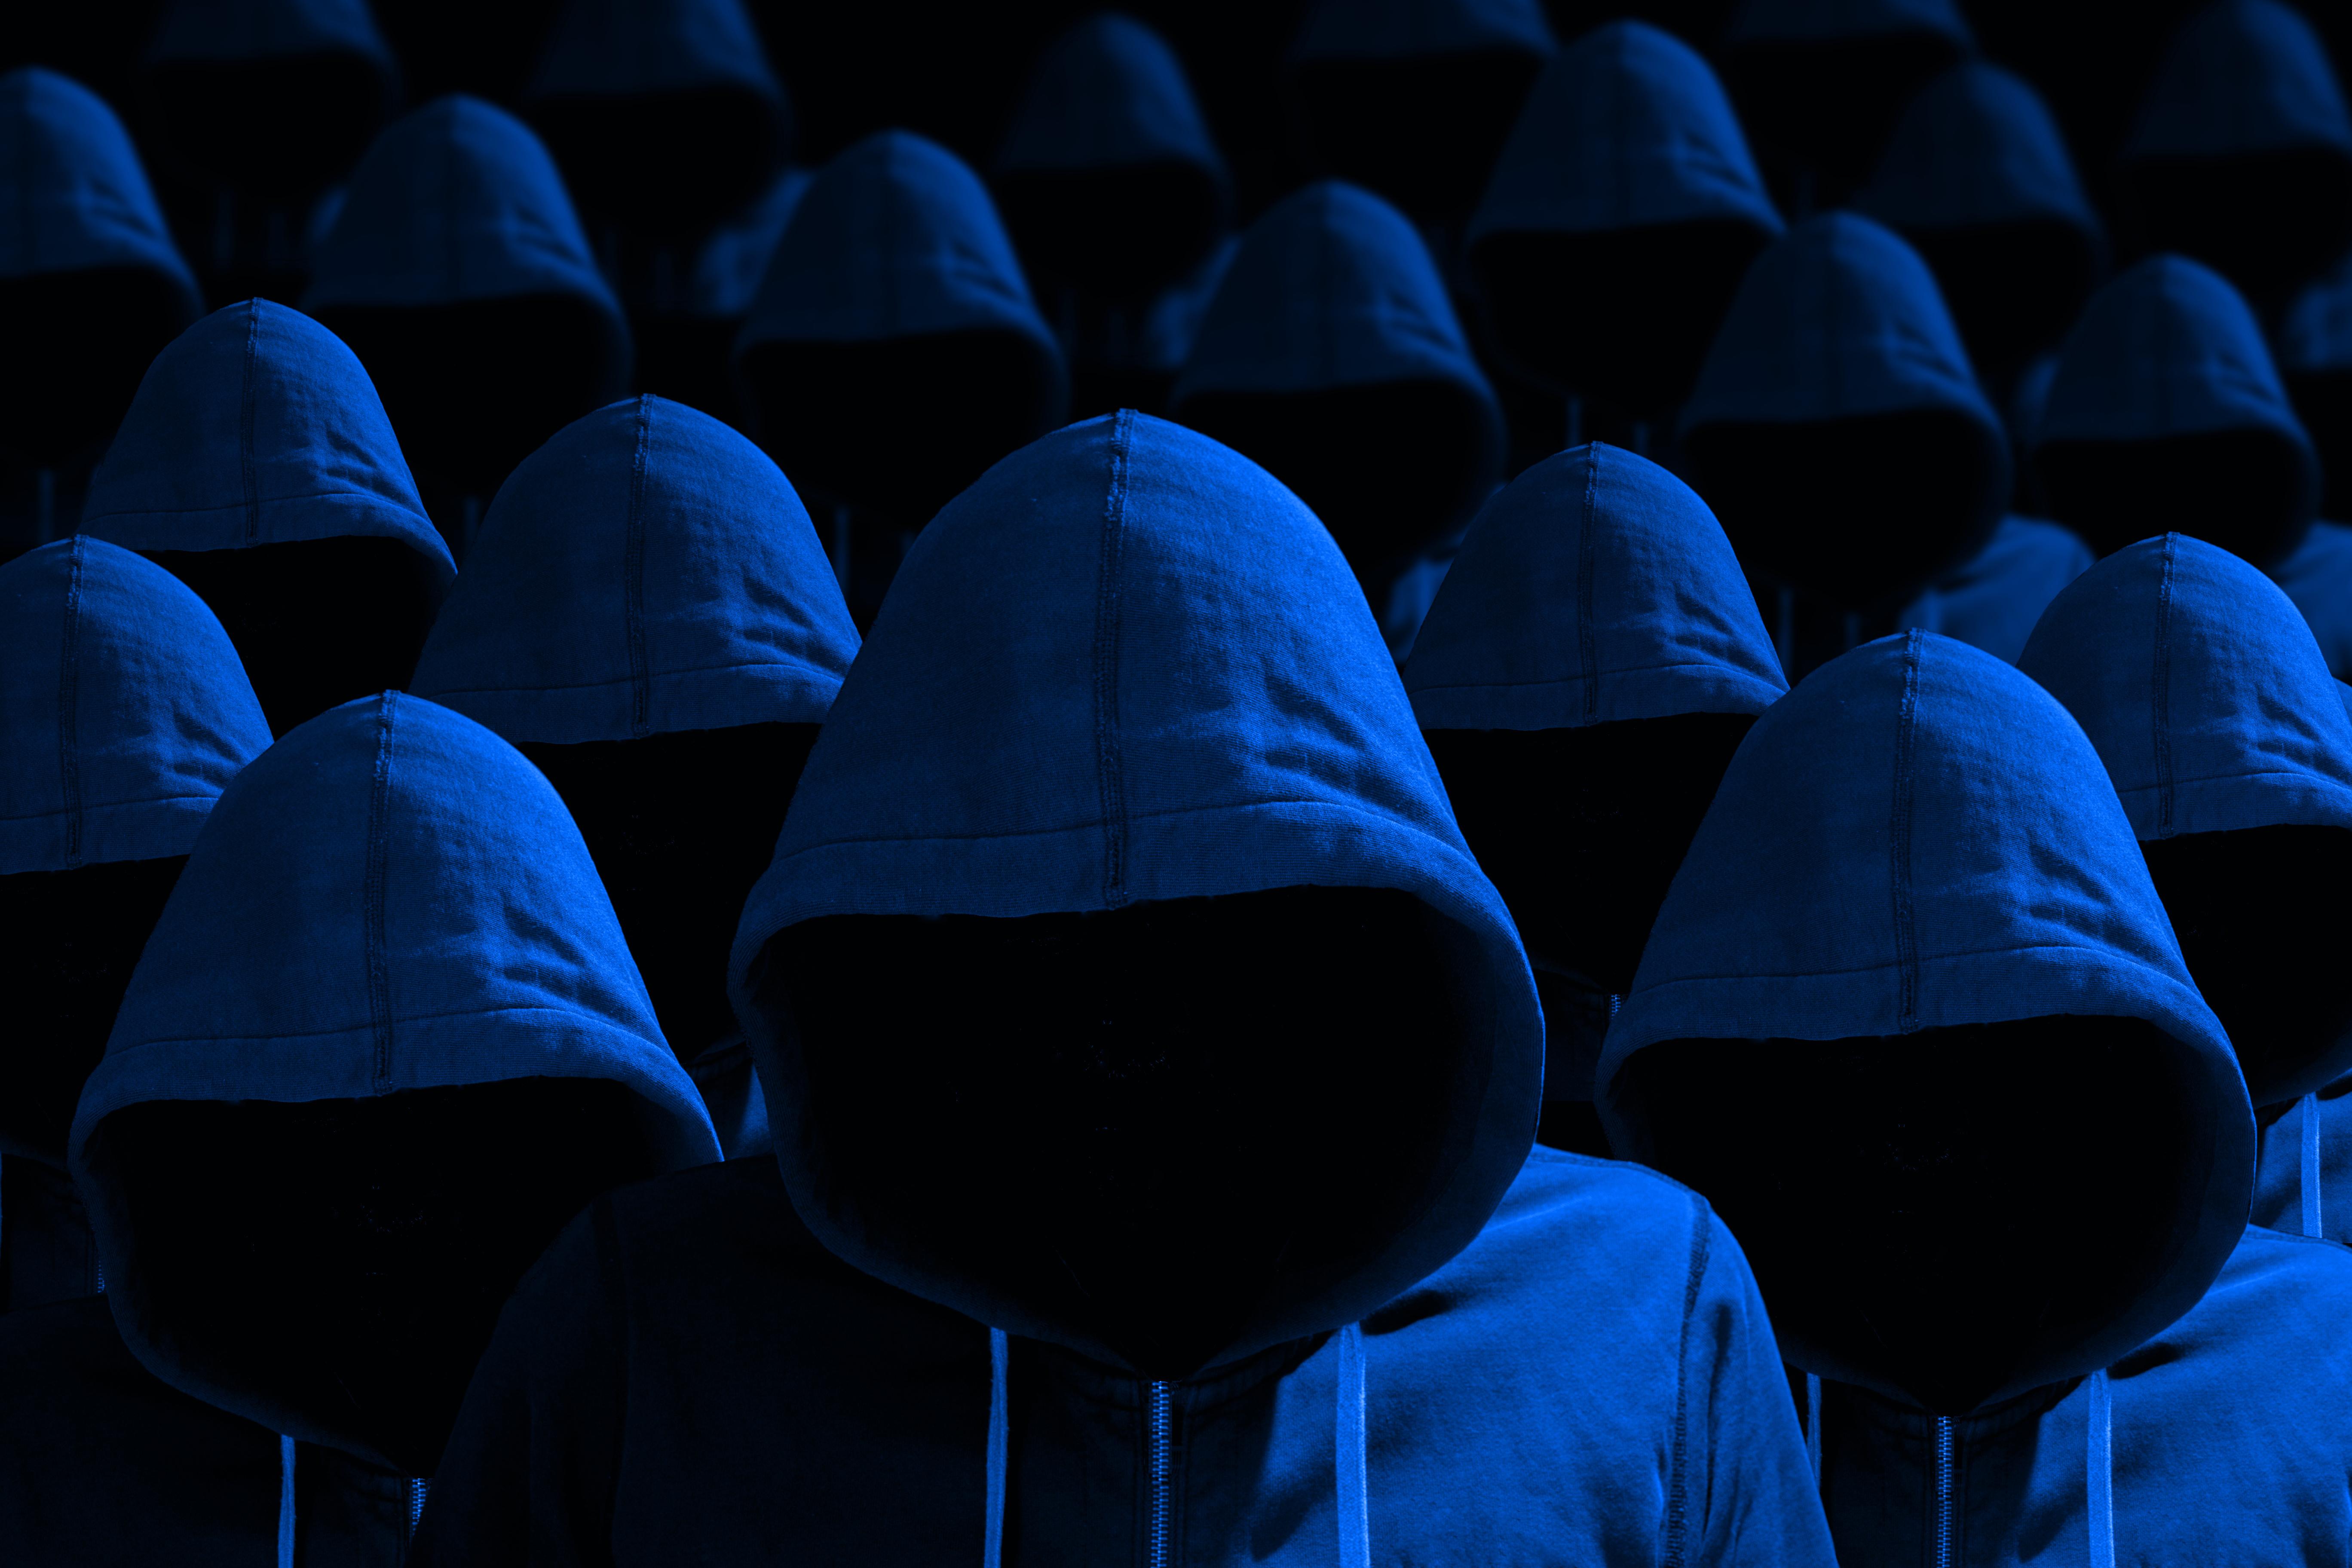 https://assets.sourcemedia.com/13/9f/de73c7f84f64af1ed89bf1a328dc/cyber-hoodies-151237881-adobe.jpg